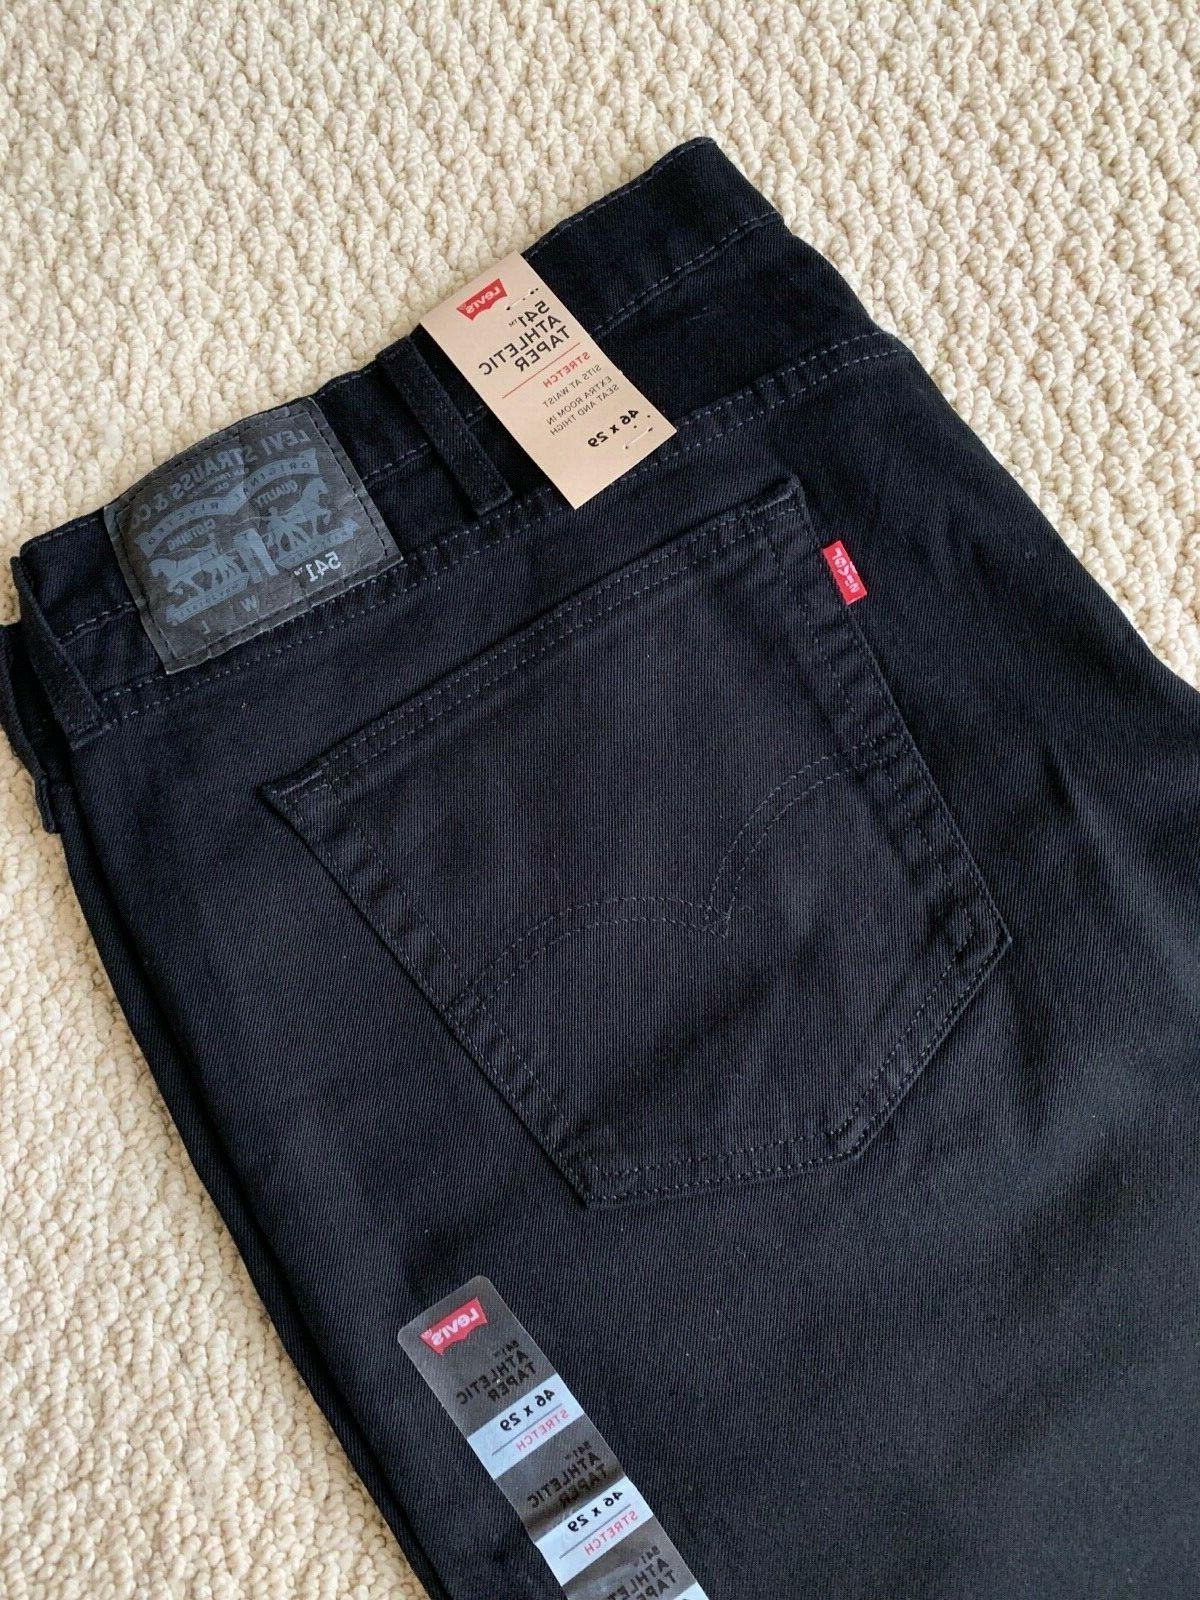 NWT Men's Athletic Taper Leg Stretch Denim Jeans SIZE